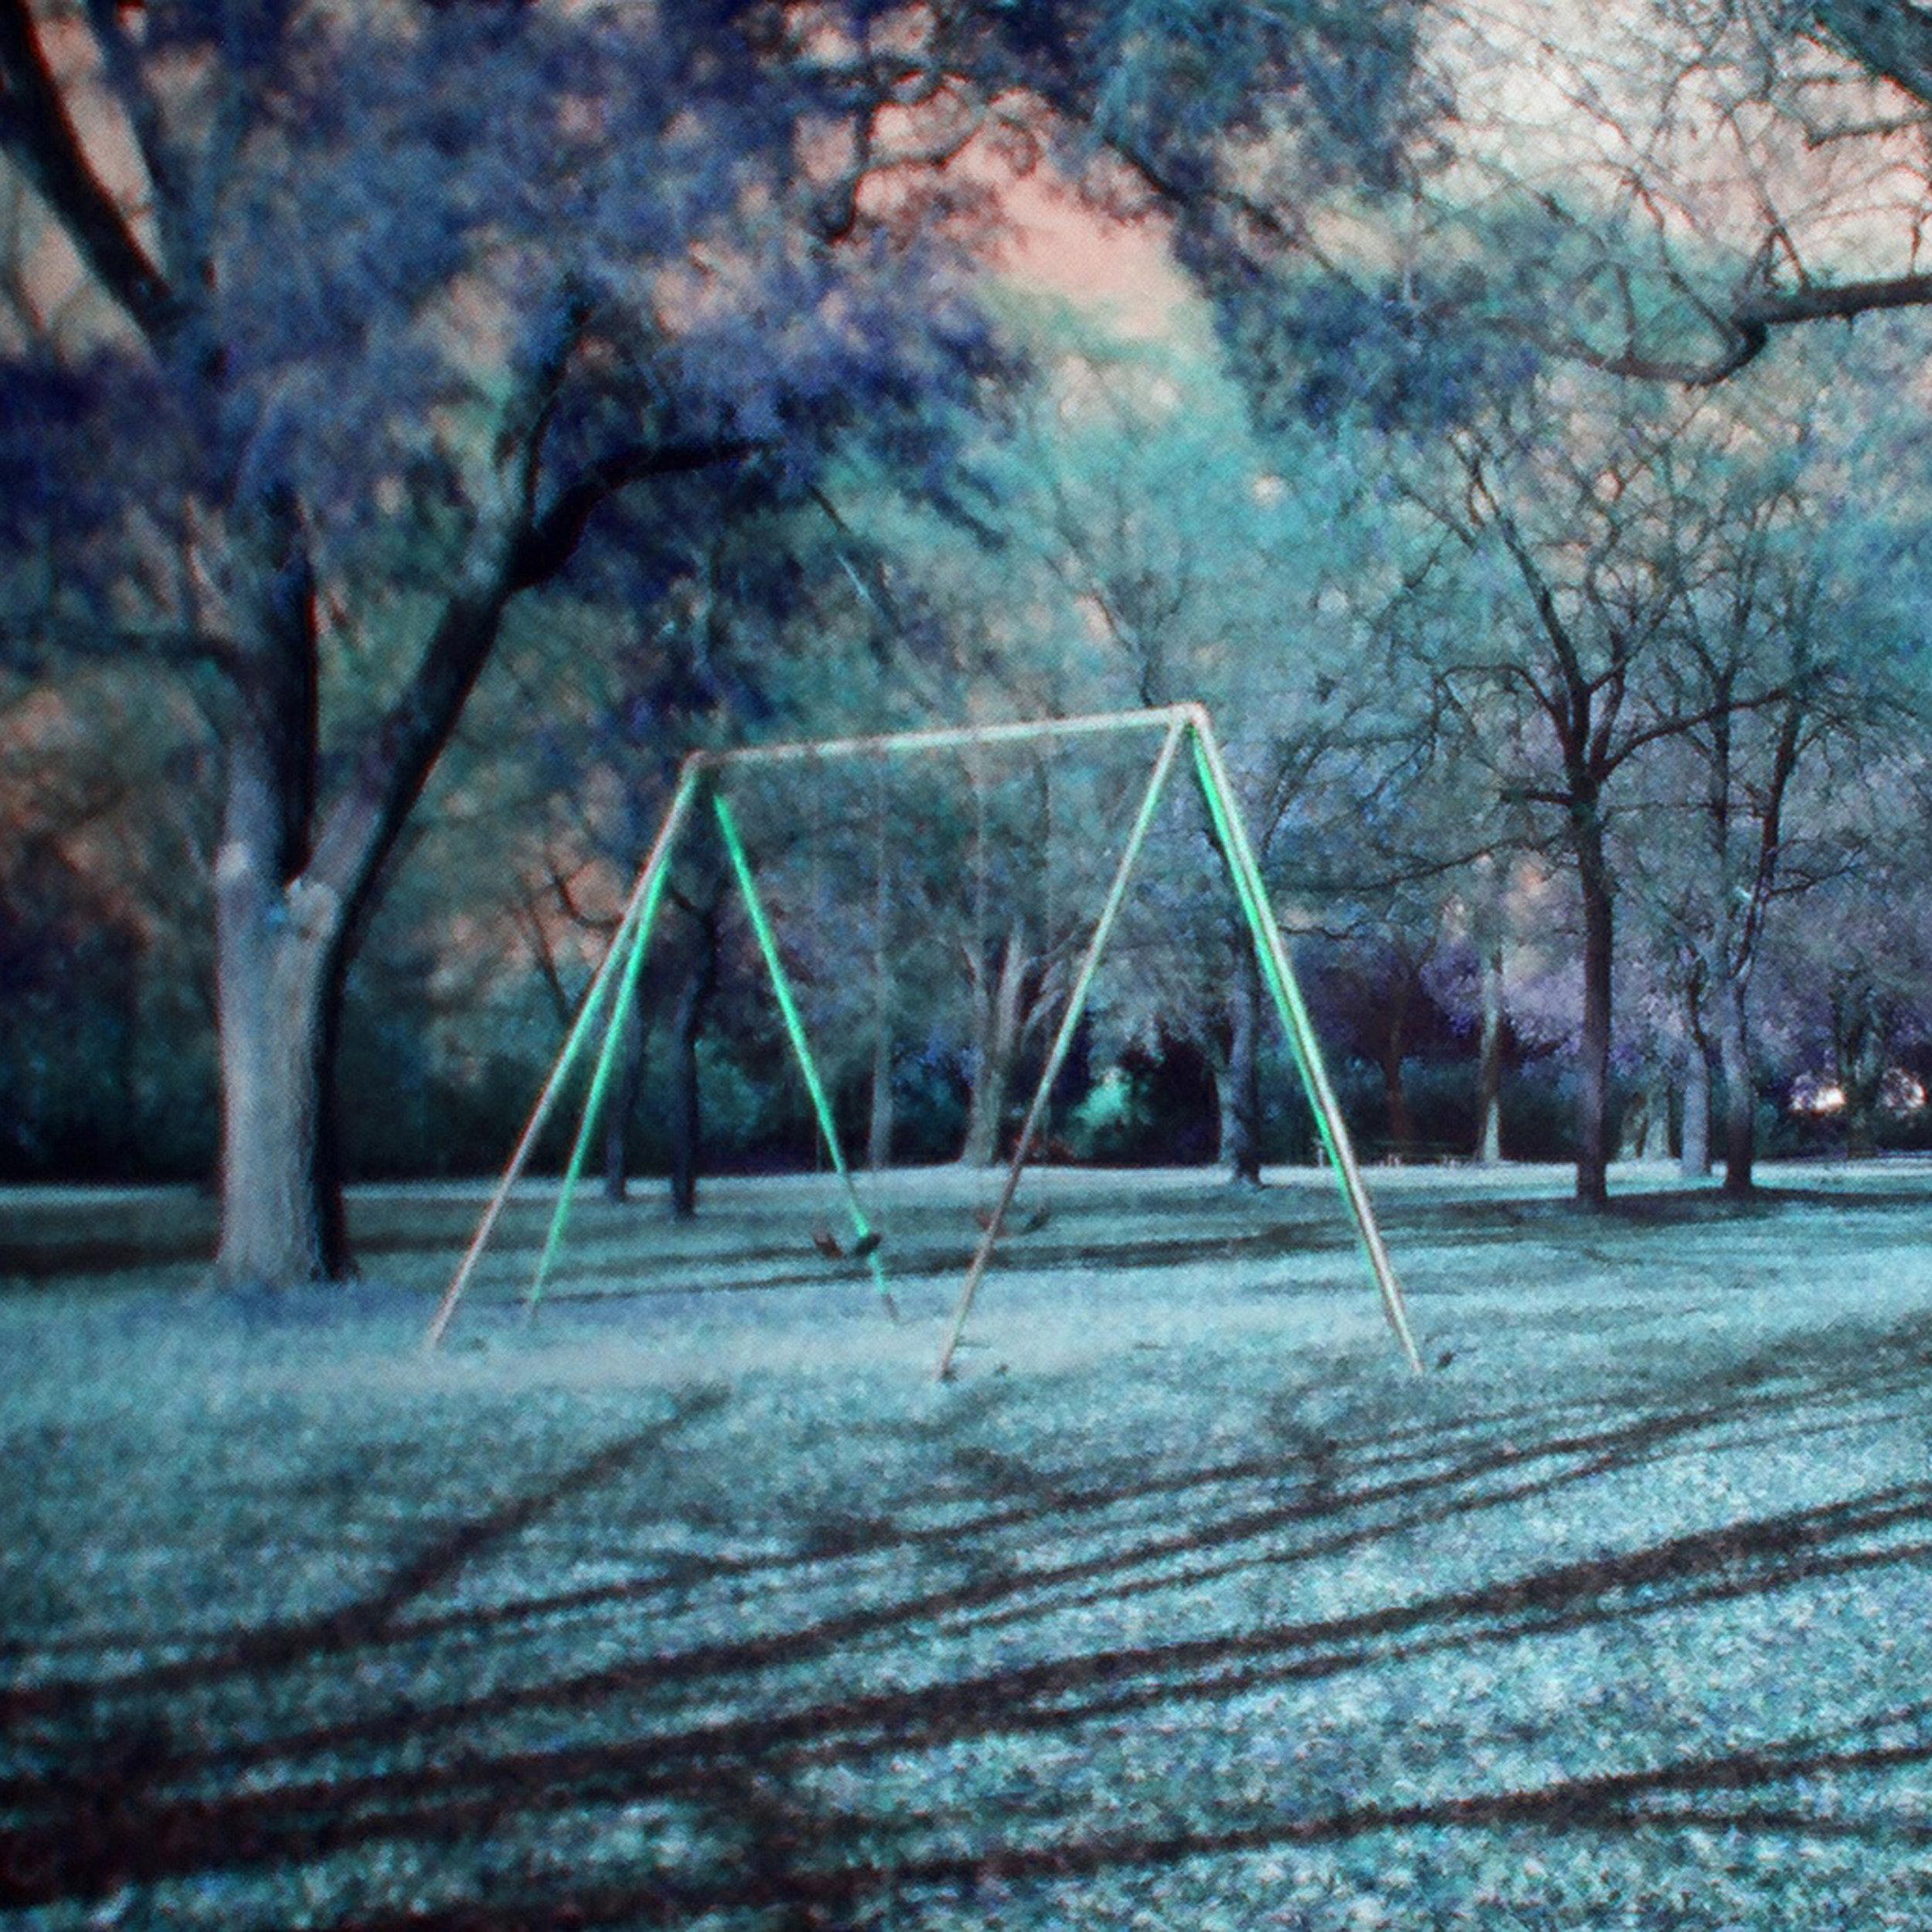 The Empty Swing